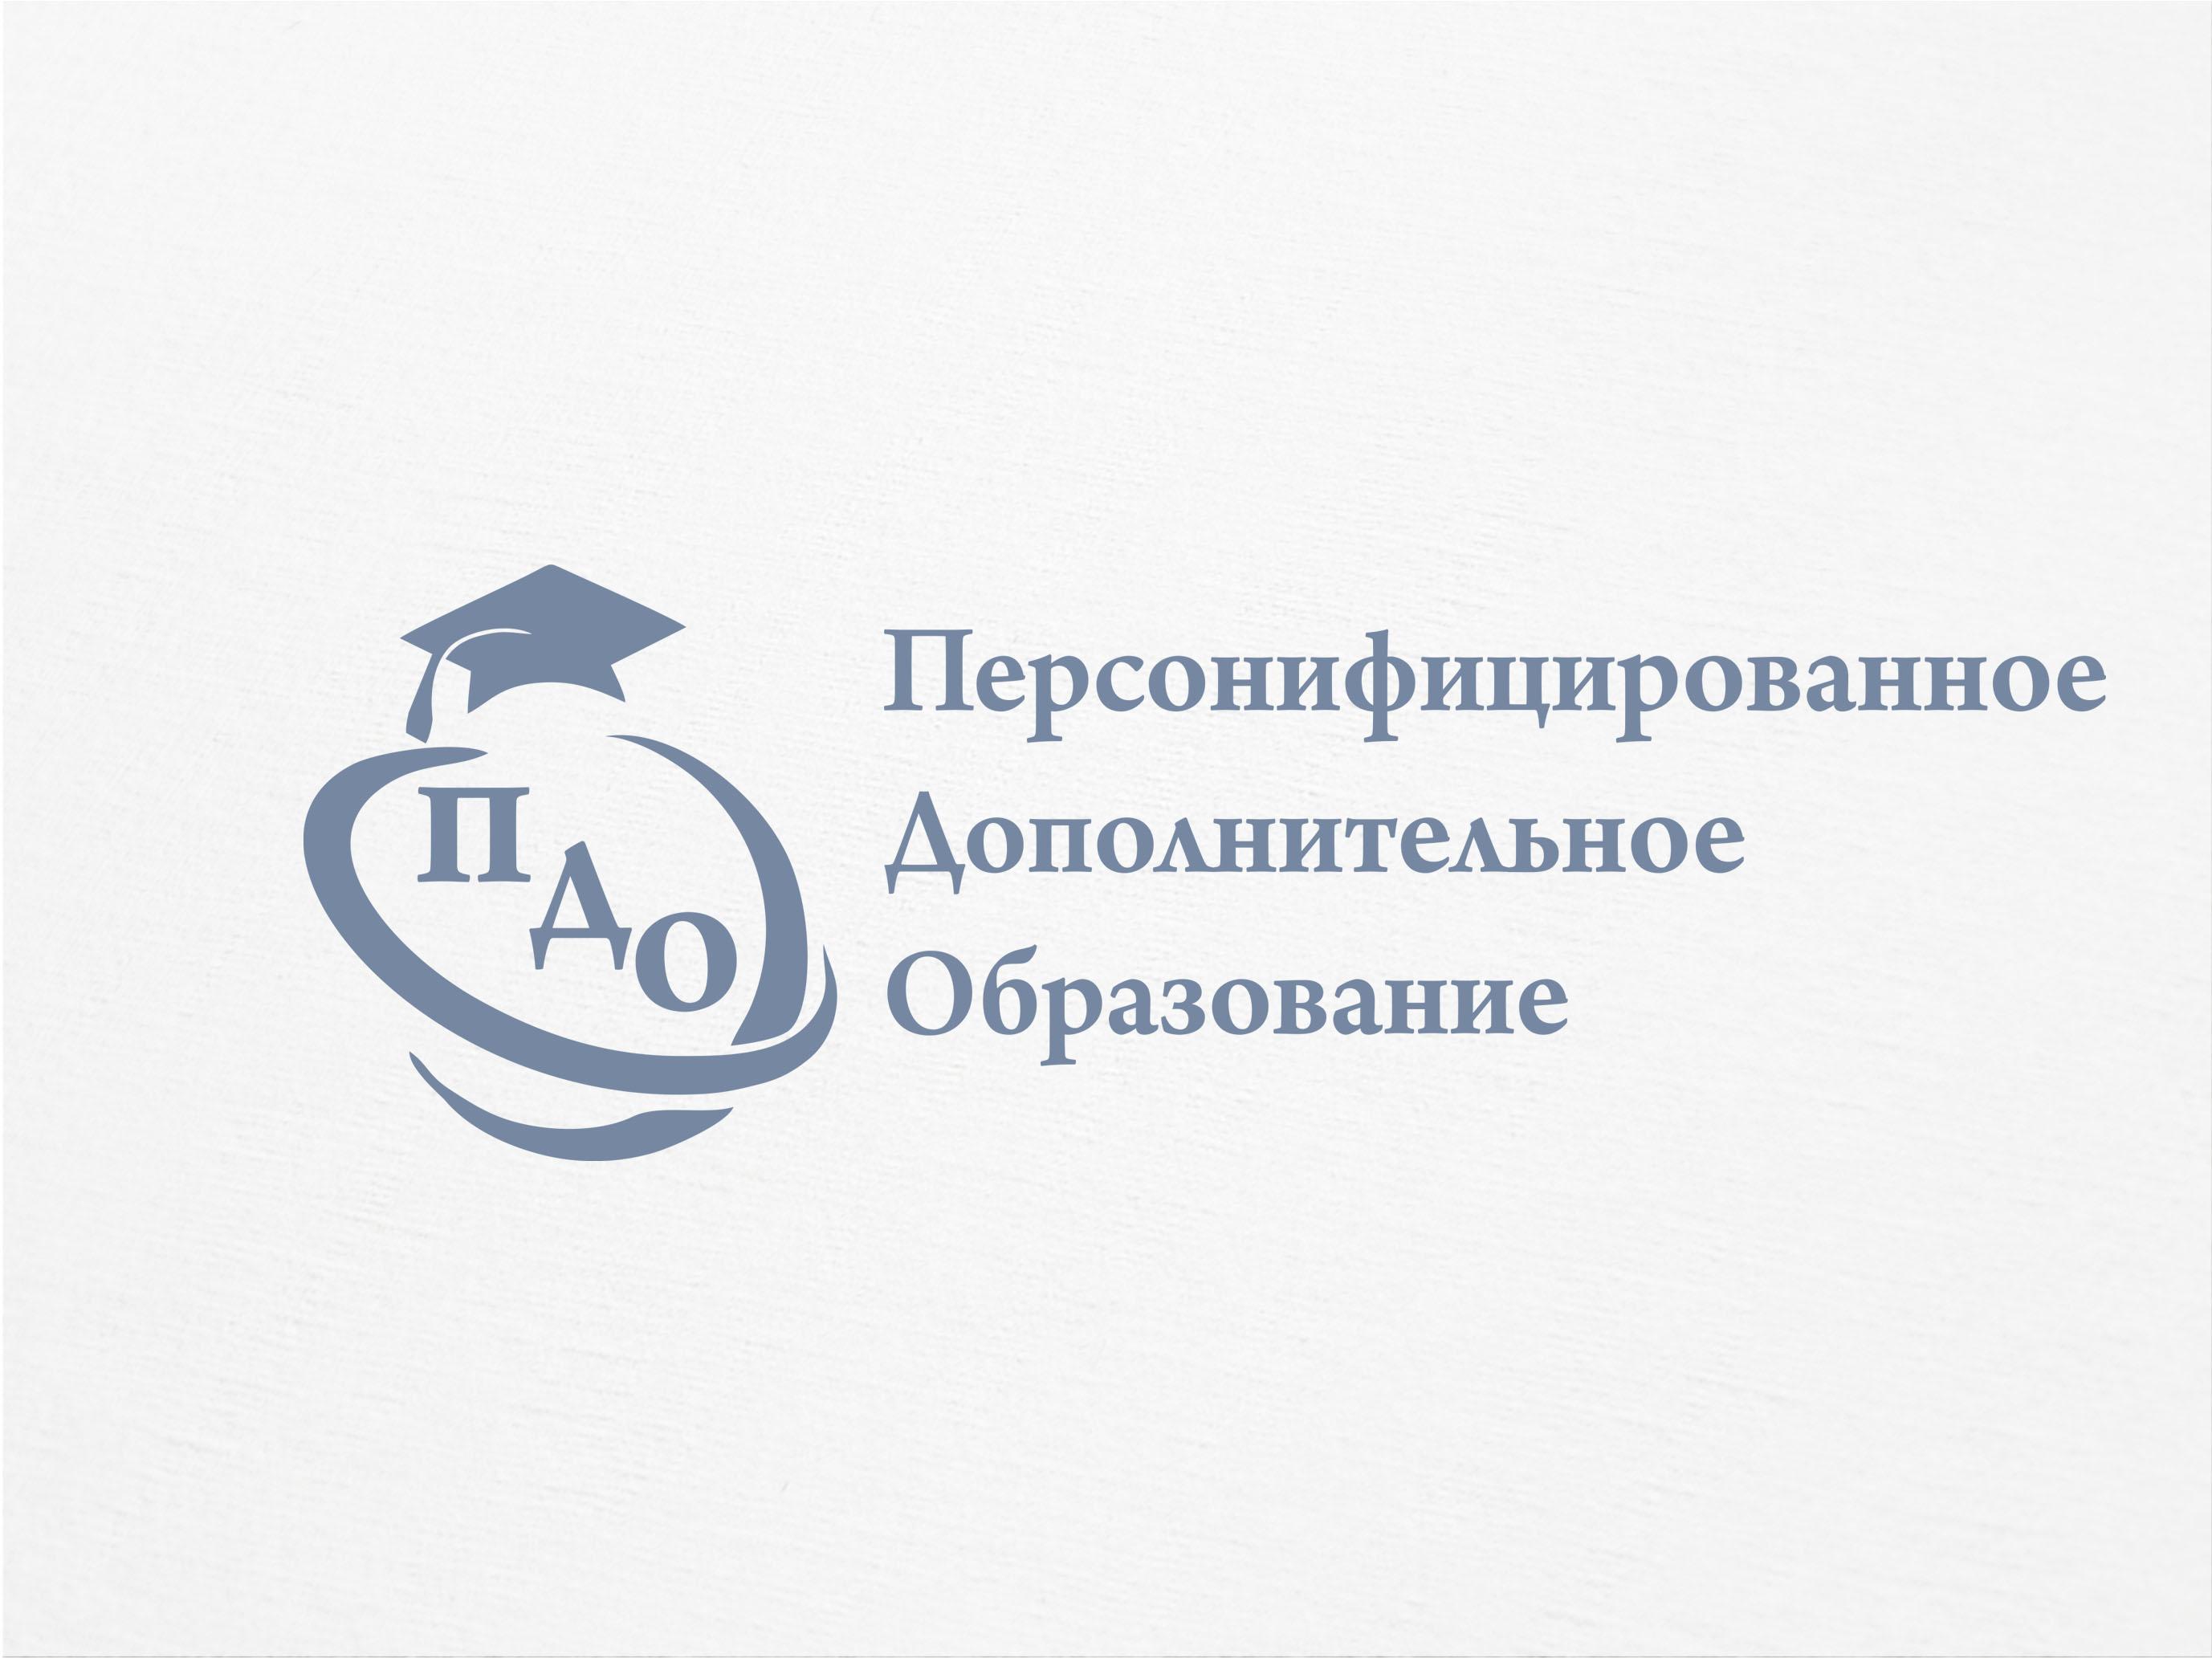 Логотип для интернет-портала фото f_8965a4b4226cf9ec.jpg